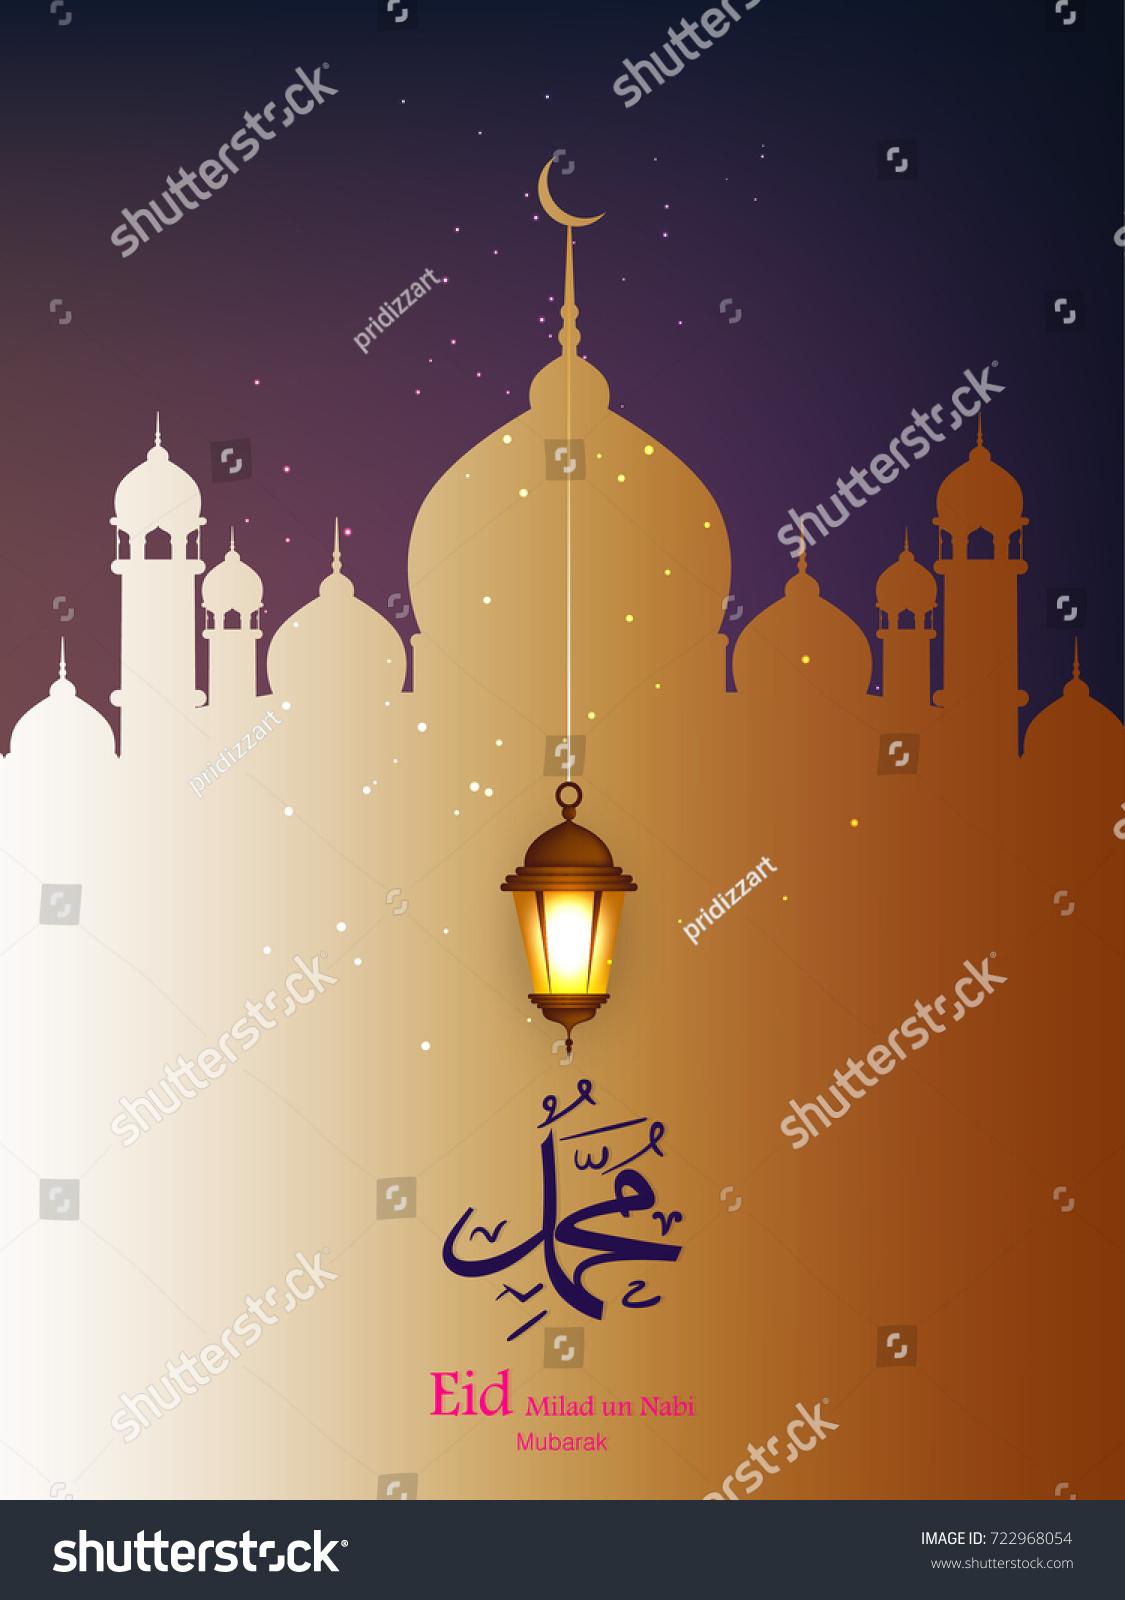 Eid Milad Un Nabi Design Vector Illustration Ez Canvas